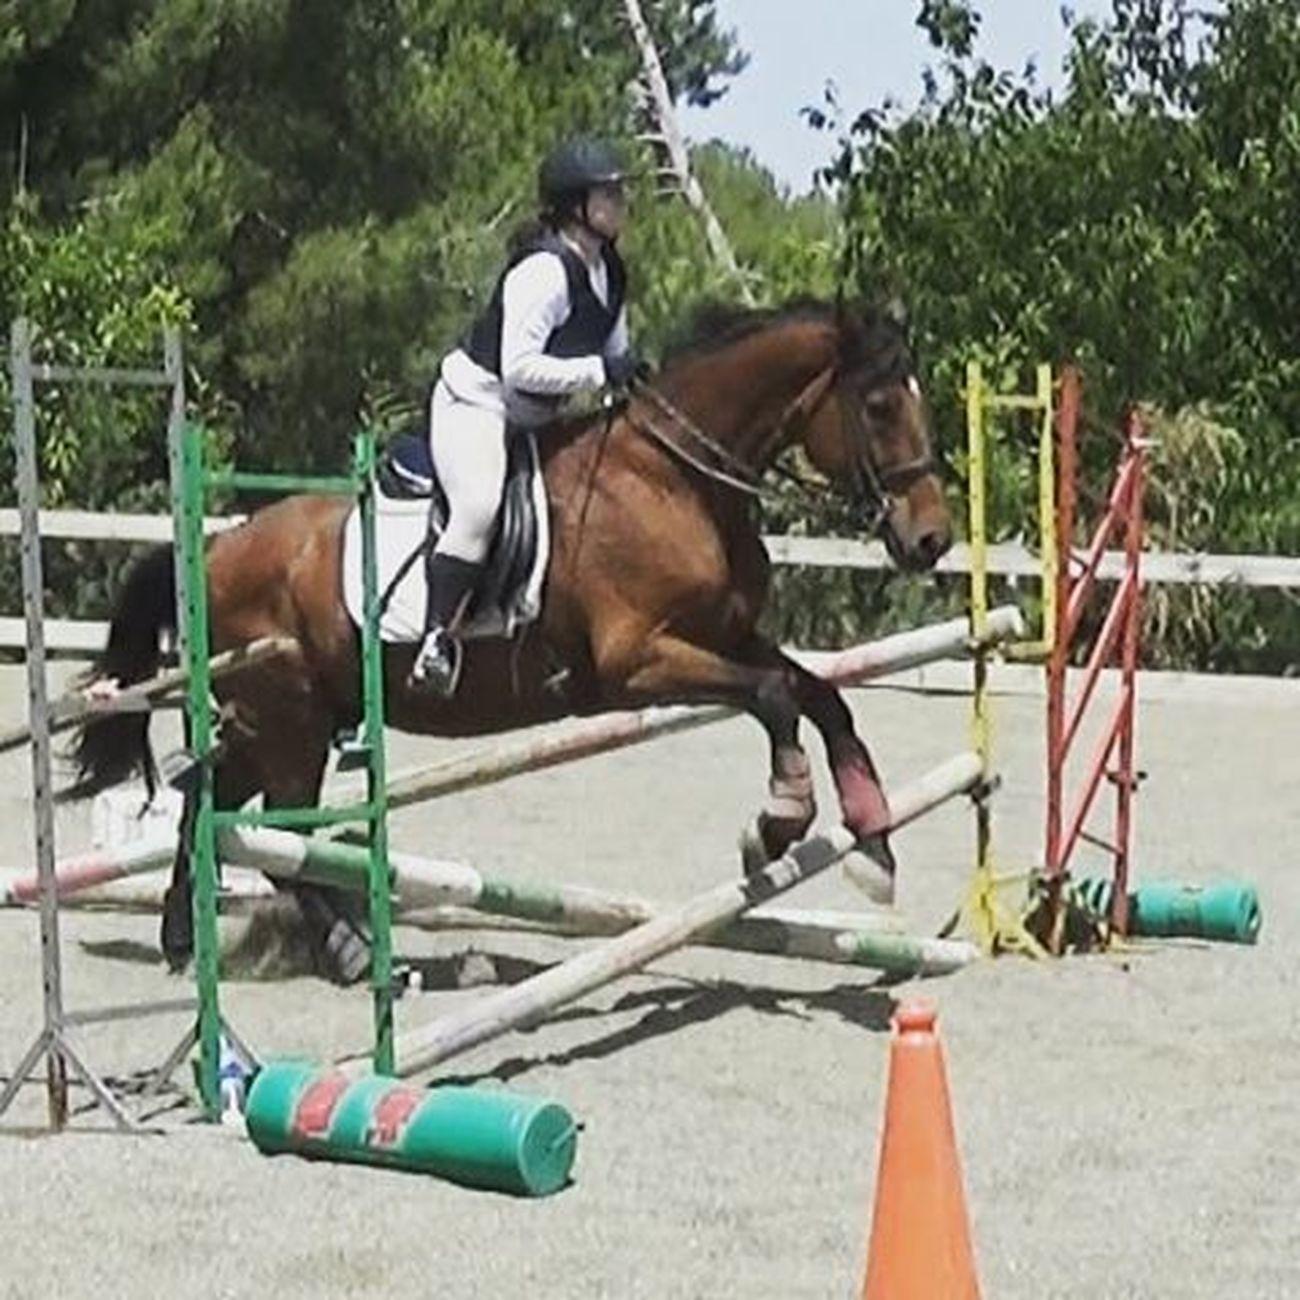 Jumping Horsestagram Equine Love Horserider Loveit Animallovers Equinephotography Binomio Passion